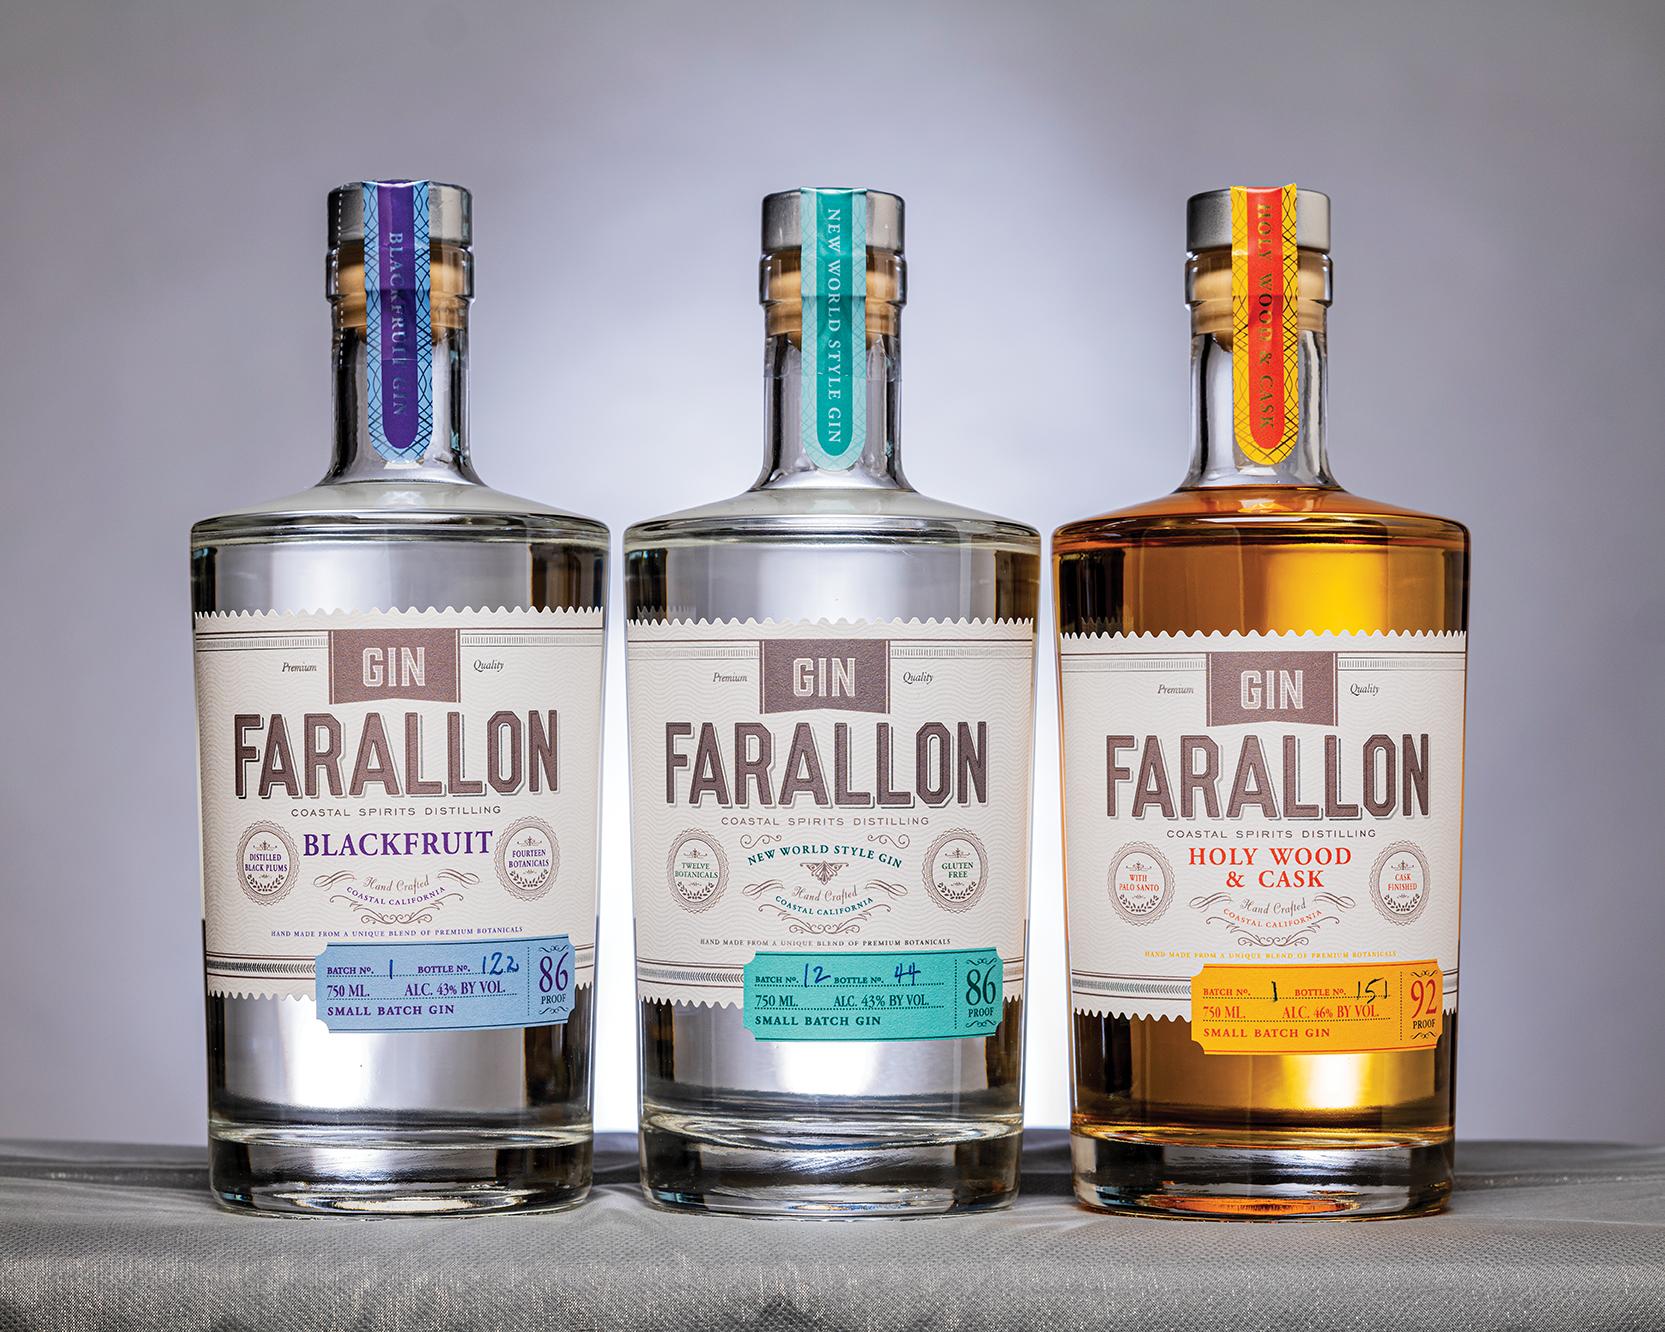 The Gin Farallon range from Coastal Spirits